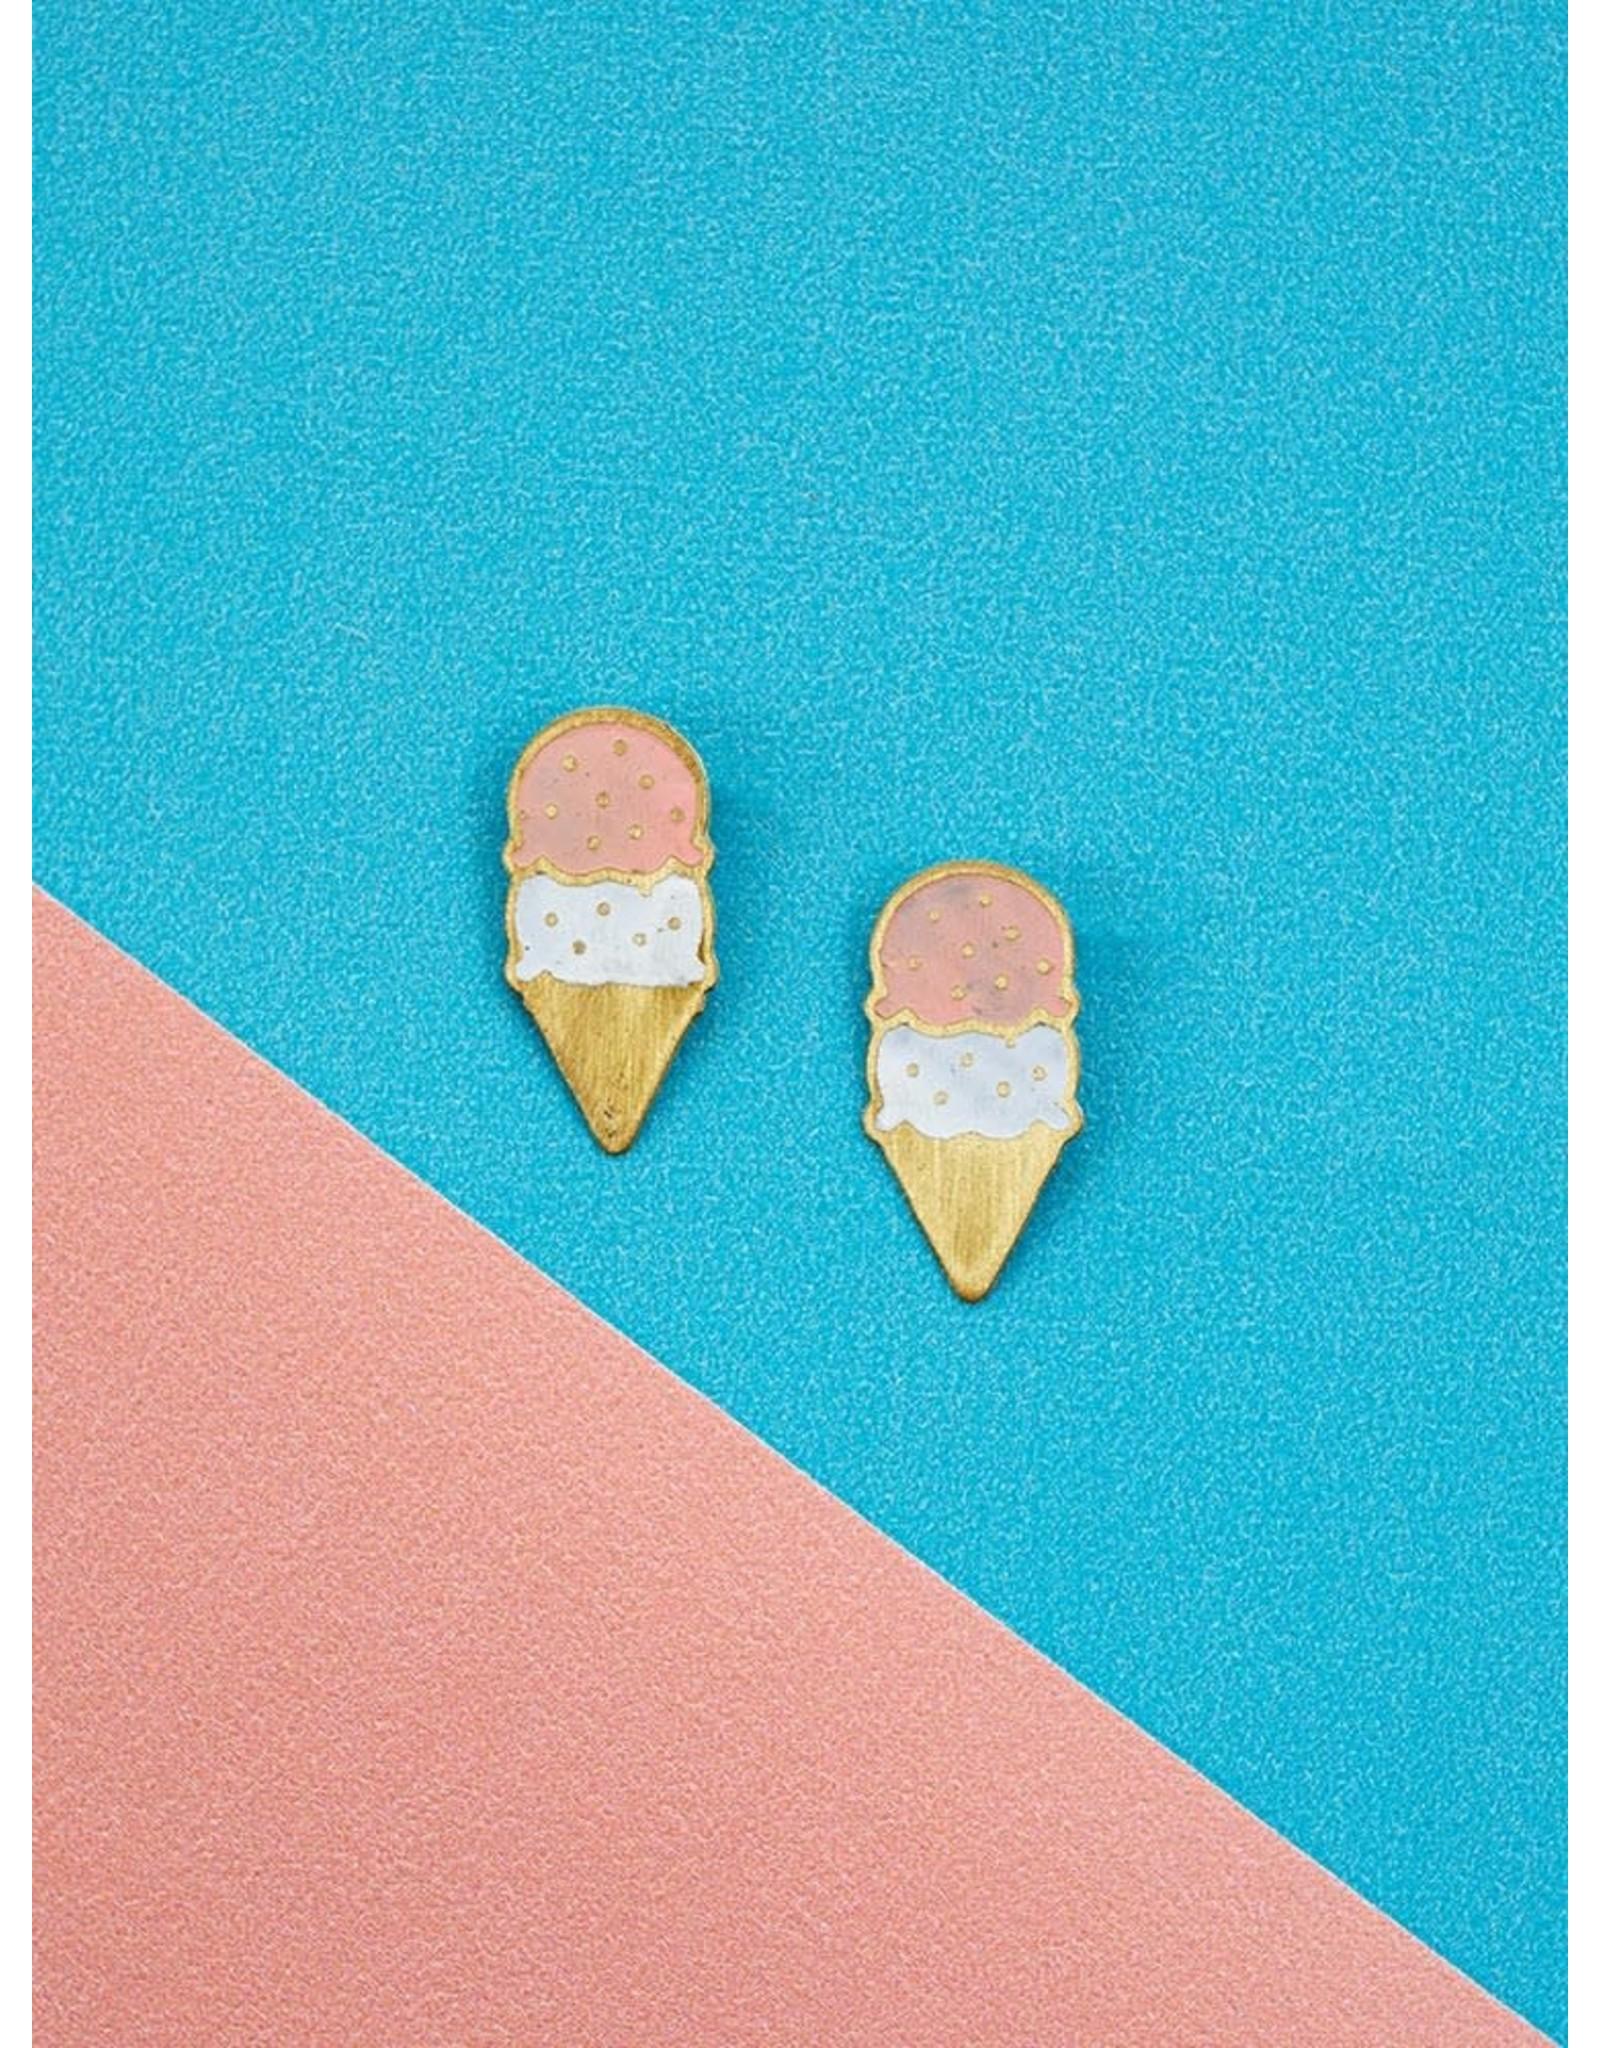 Neapolitan Ice Cream Stud Earrings, India.